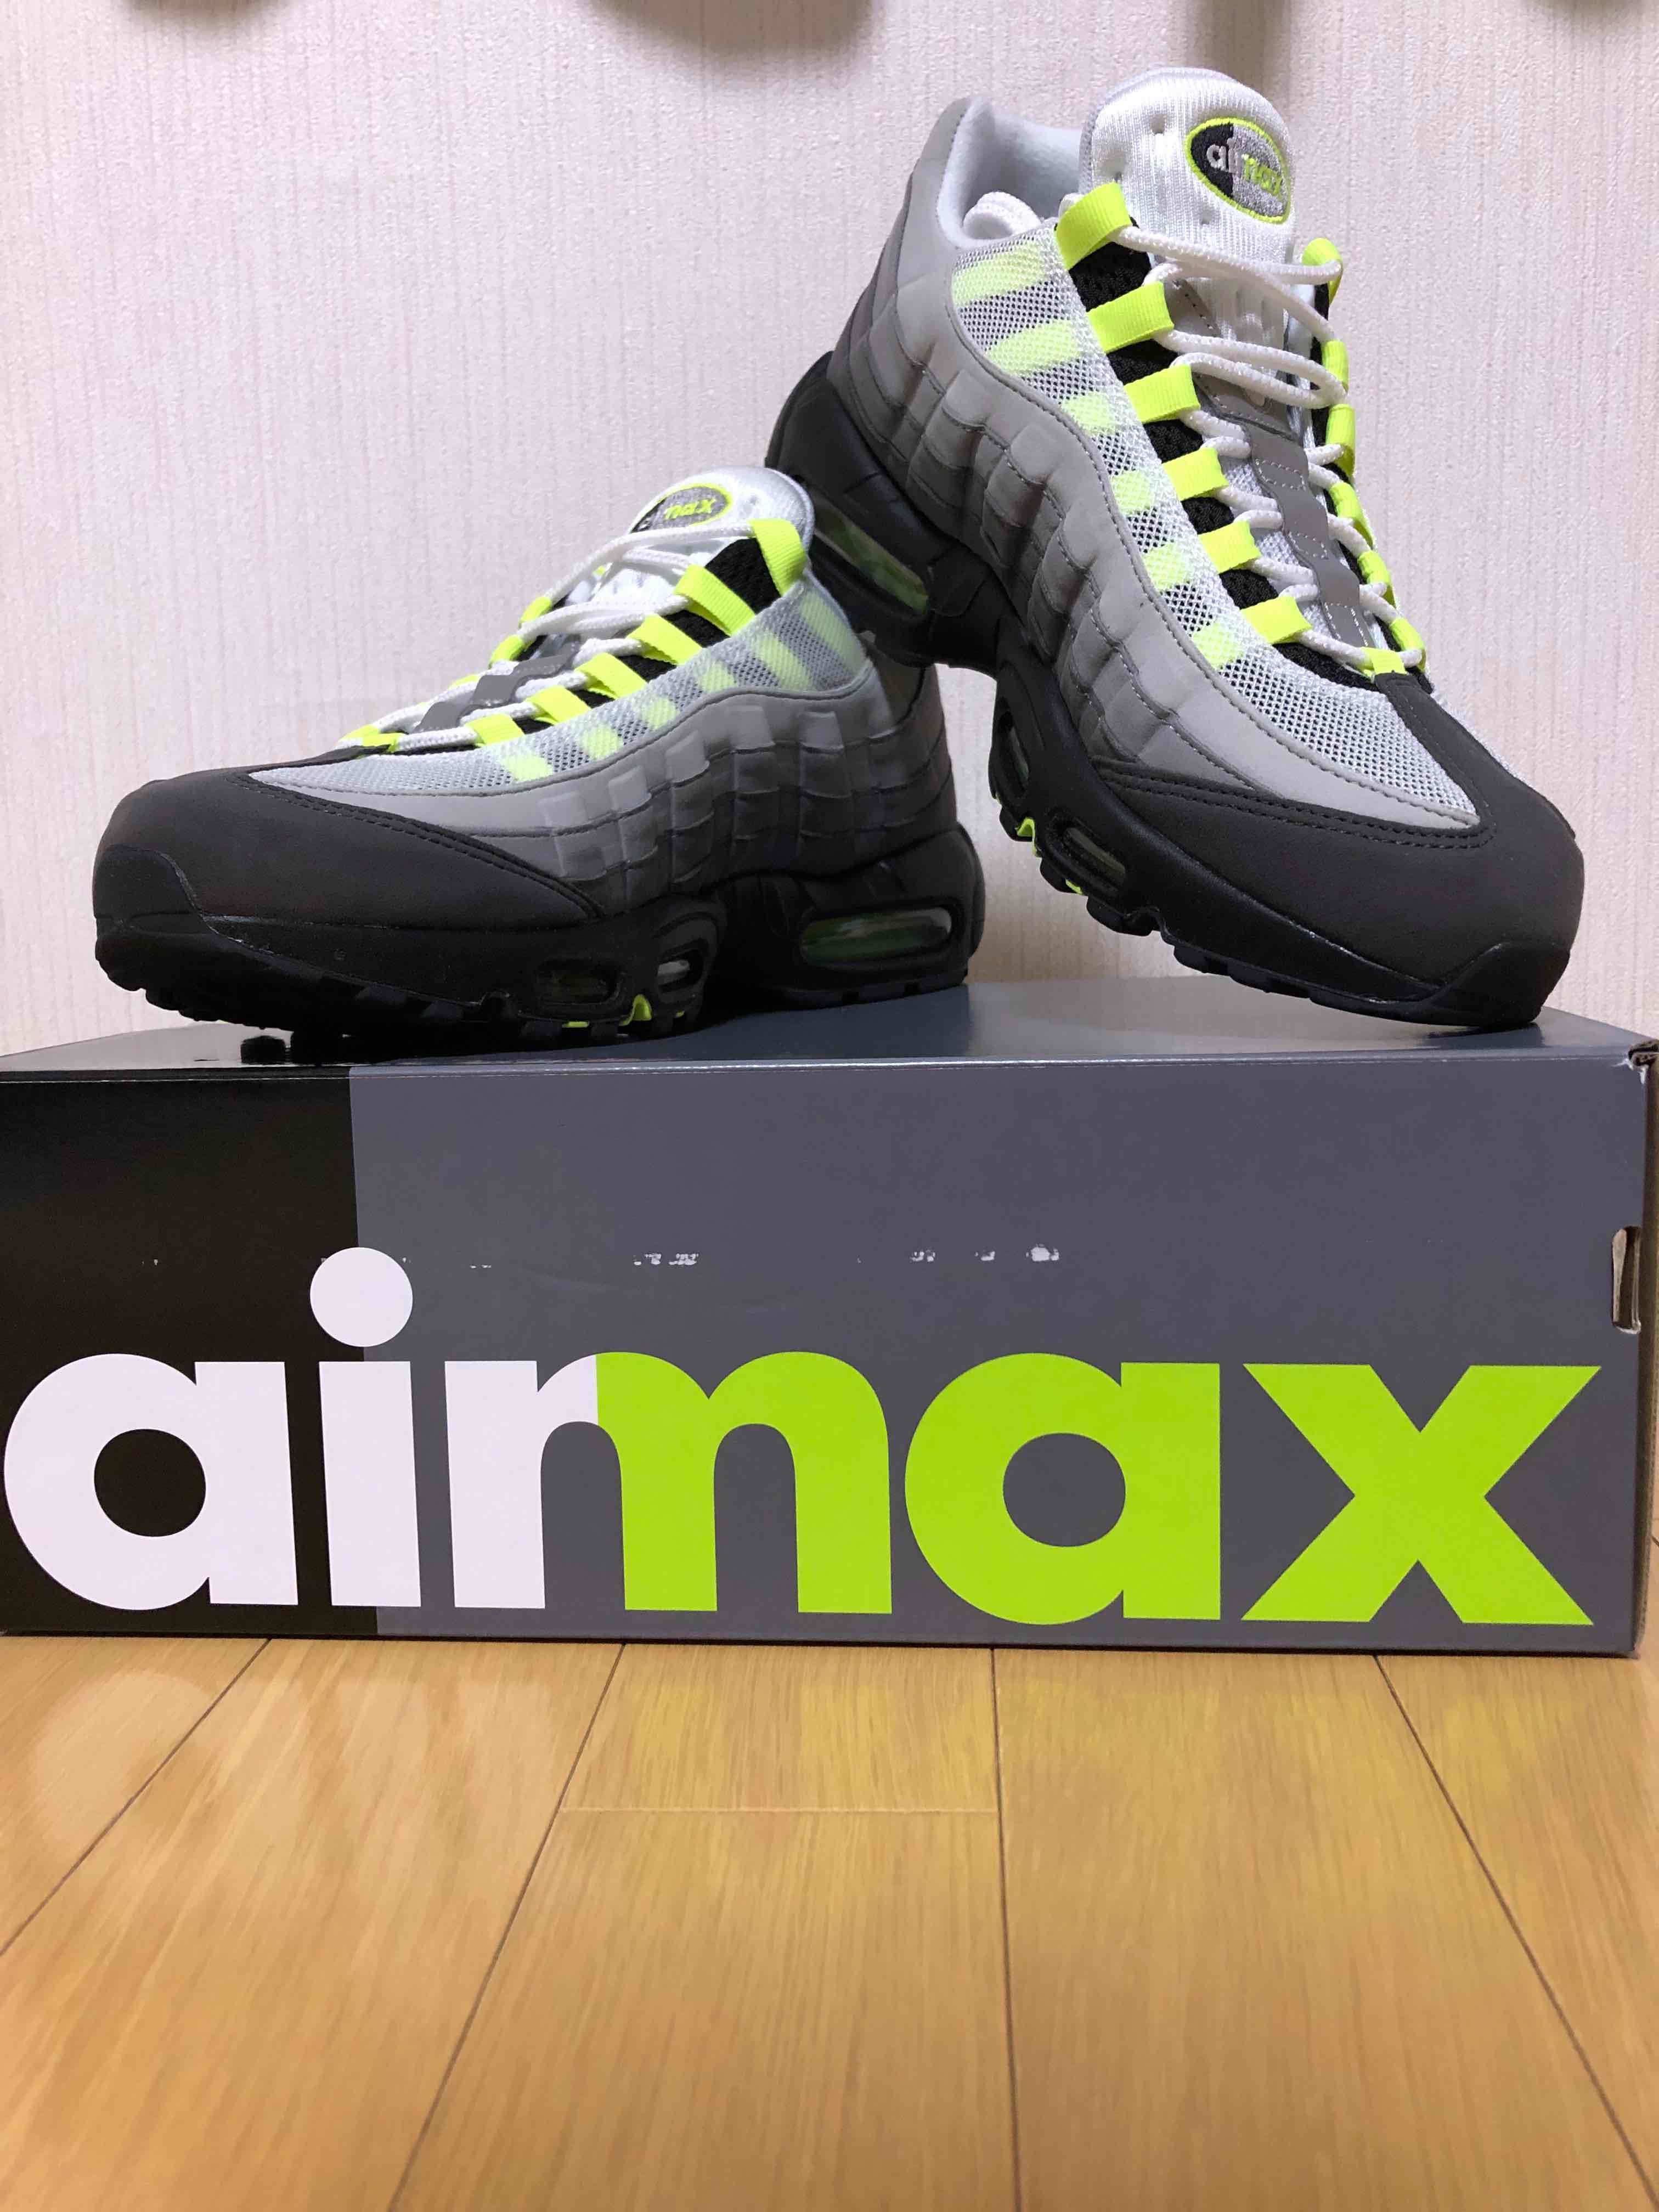 airmax95 イエローグラデ デザインがカッコいい!